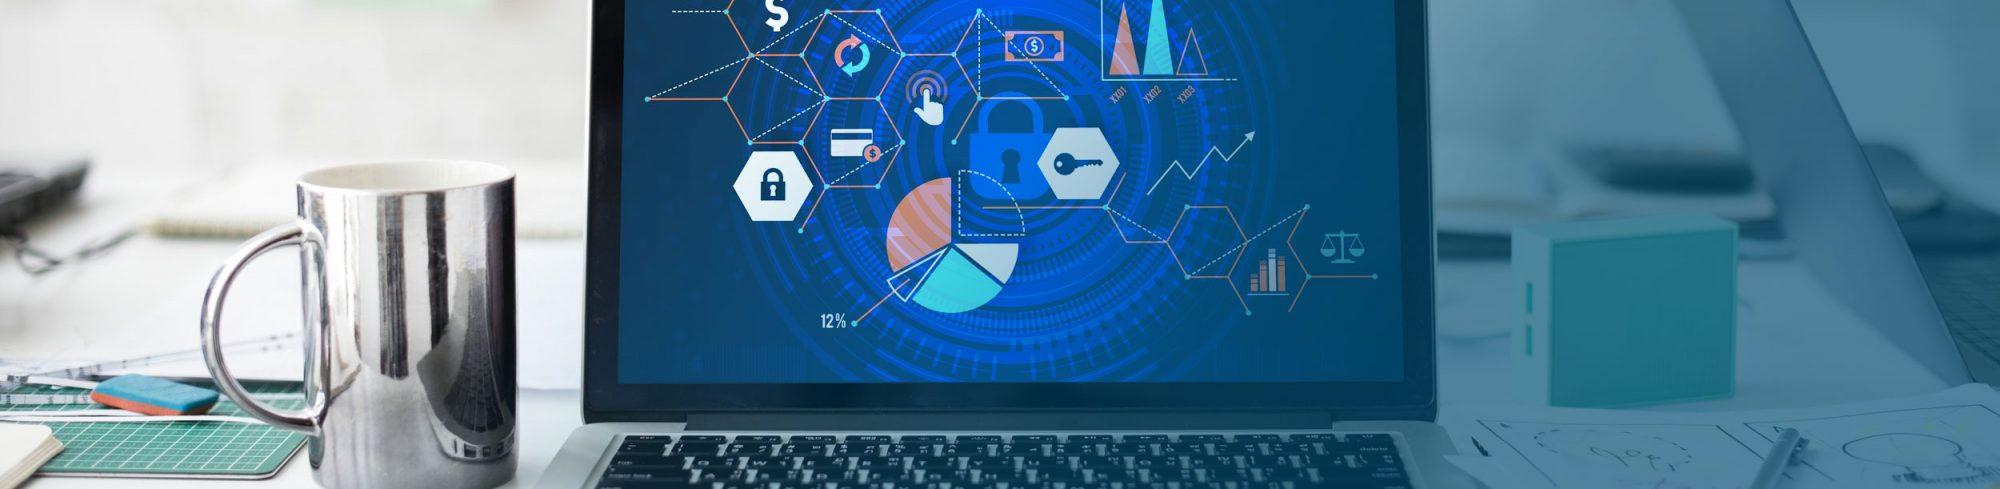 Data Integrity in Restoration Company